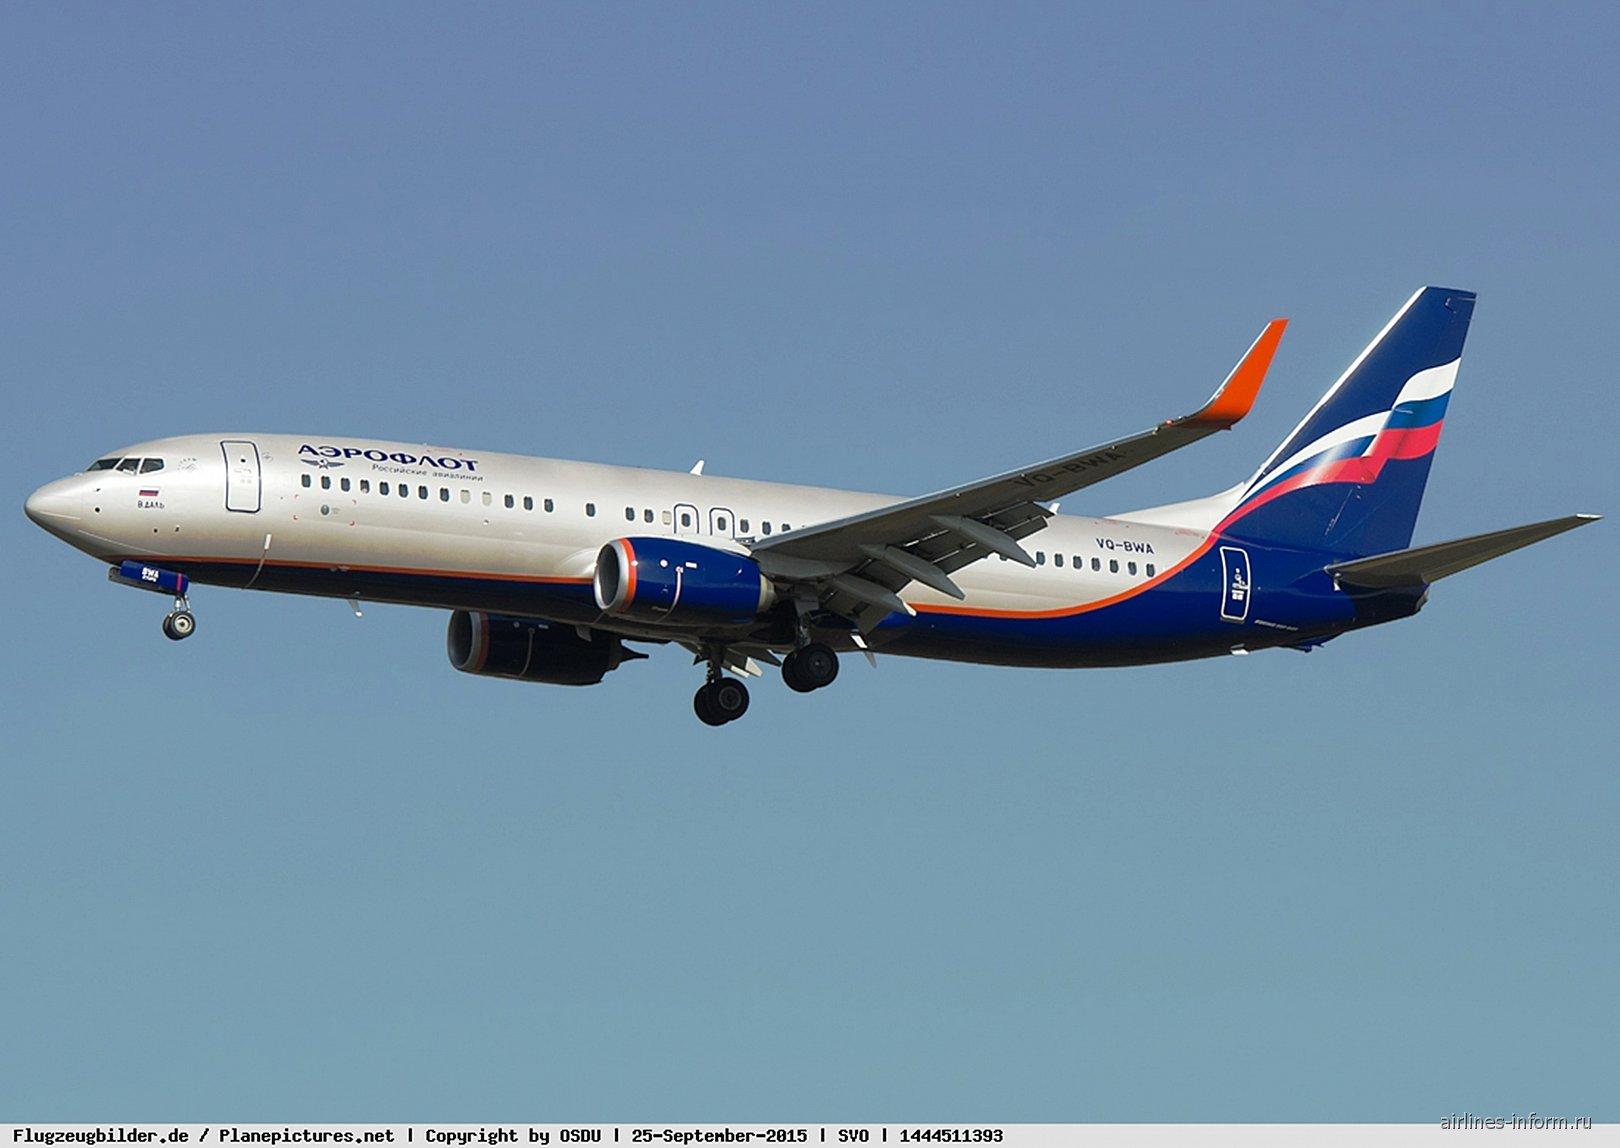 Москва - Тель-Авив на Б737-800 Аэрофлота: 4 оттенка Аэрофлота. Бонус: аэропорт Эйлат